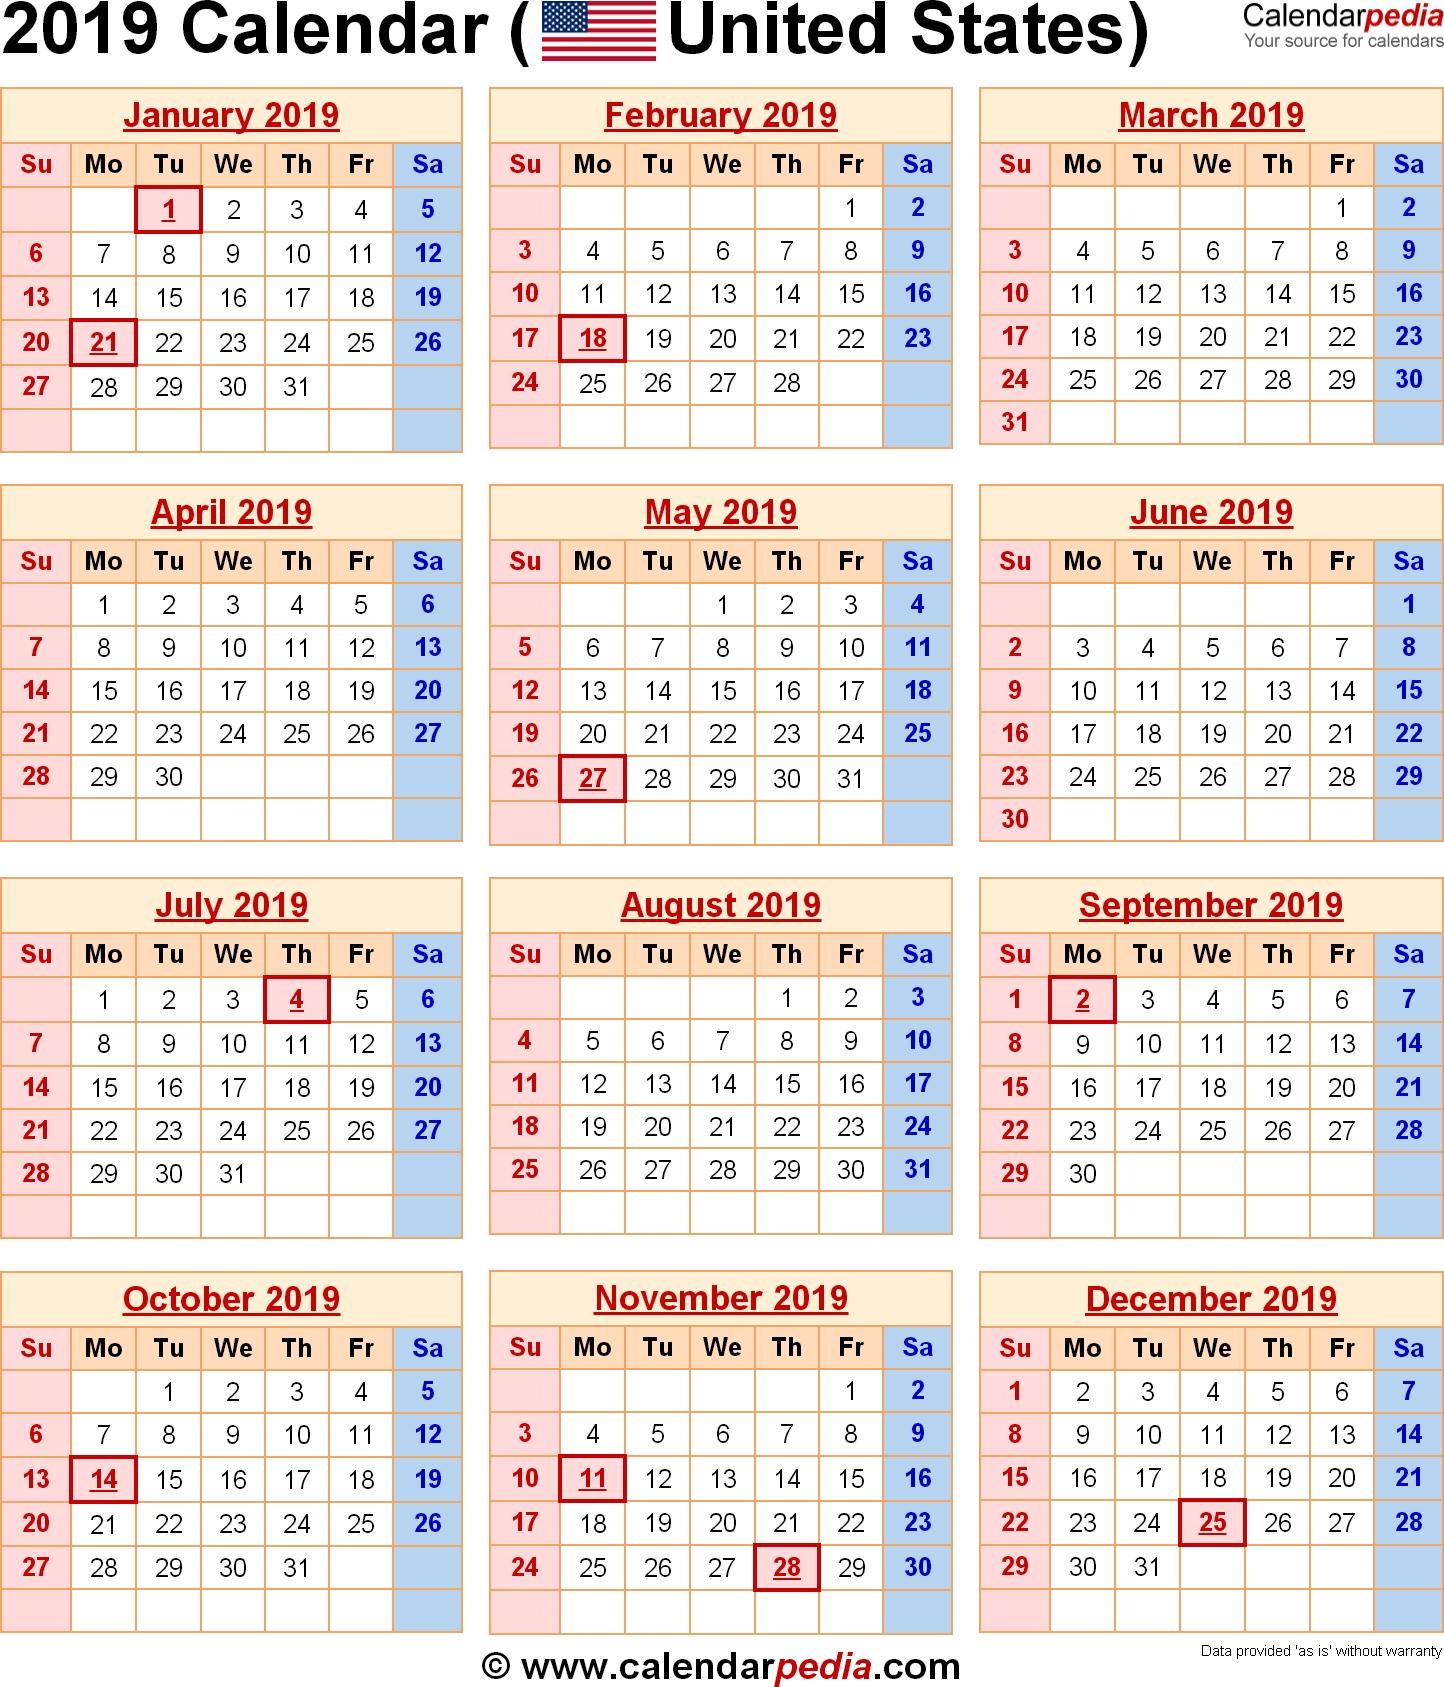 2019 Calendar United States | Us Federal Holidays | 2019 Calendar Us Calendar 2019 Usa